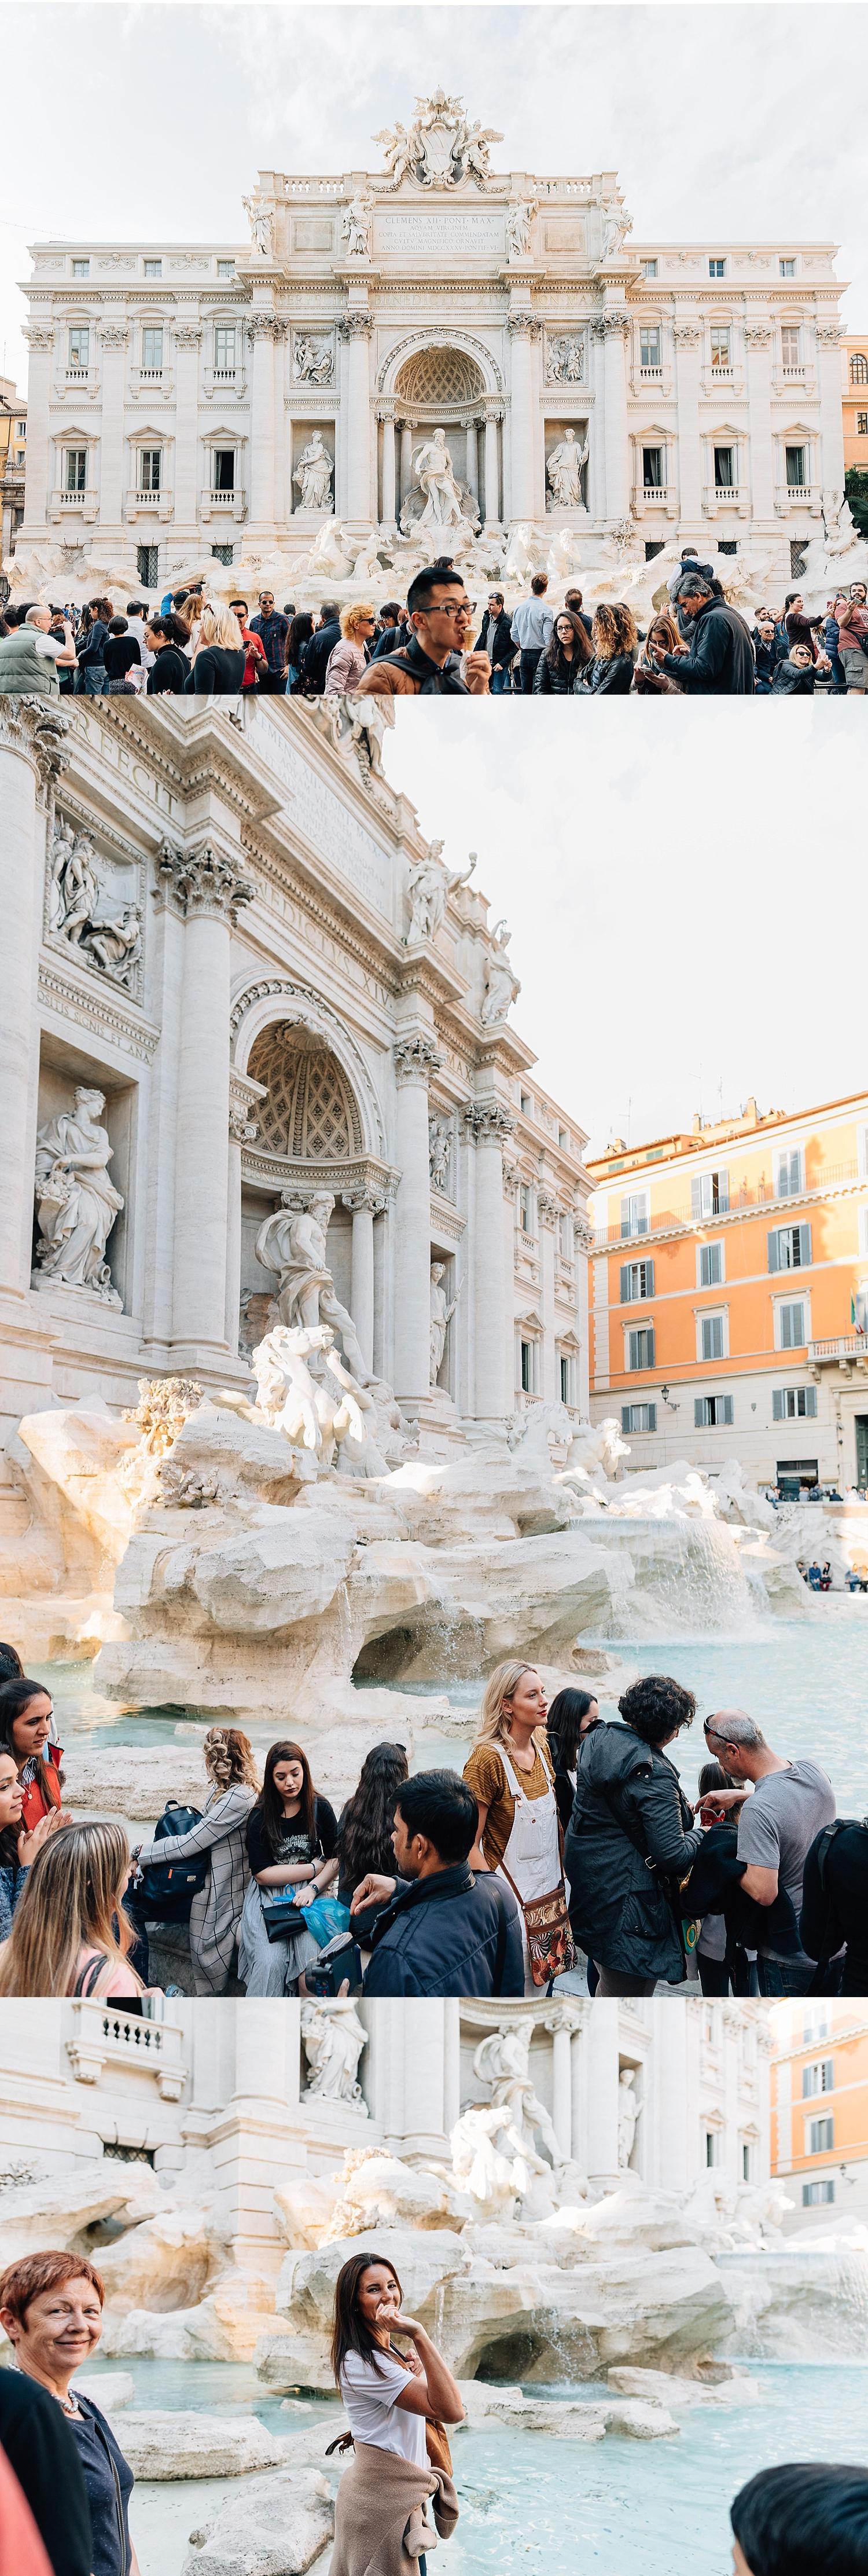 Fontana di Trevi - The Trevi Fountain